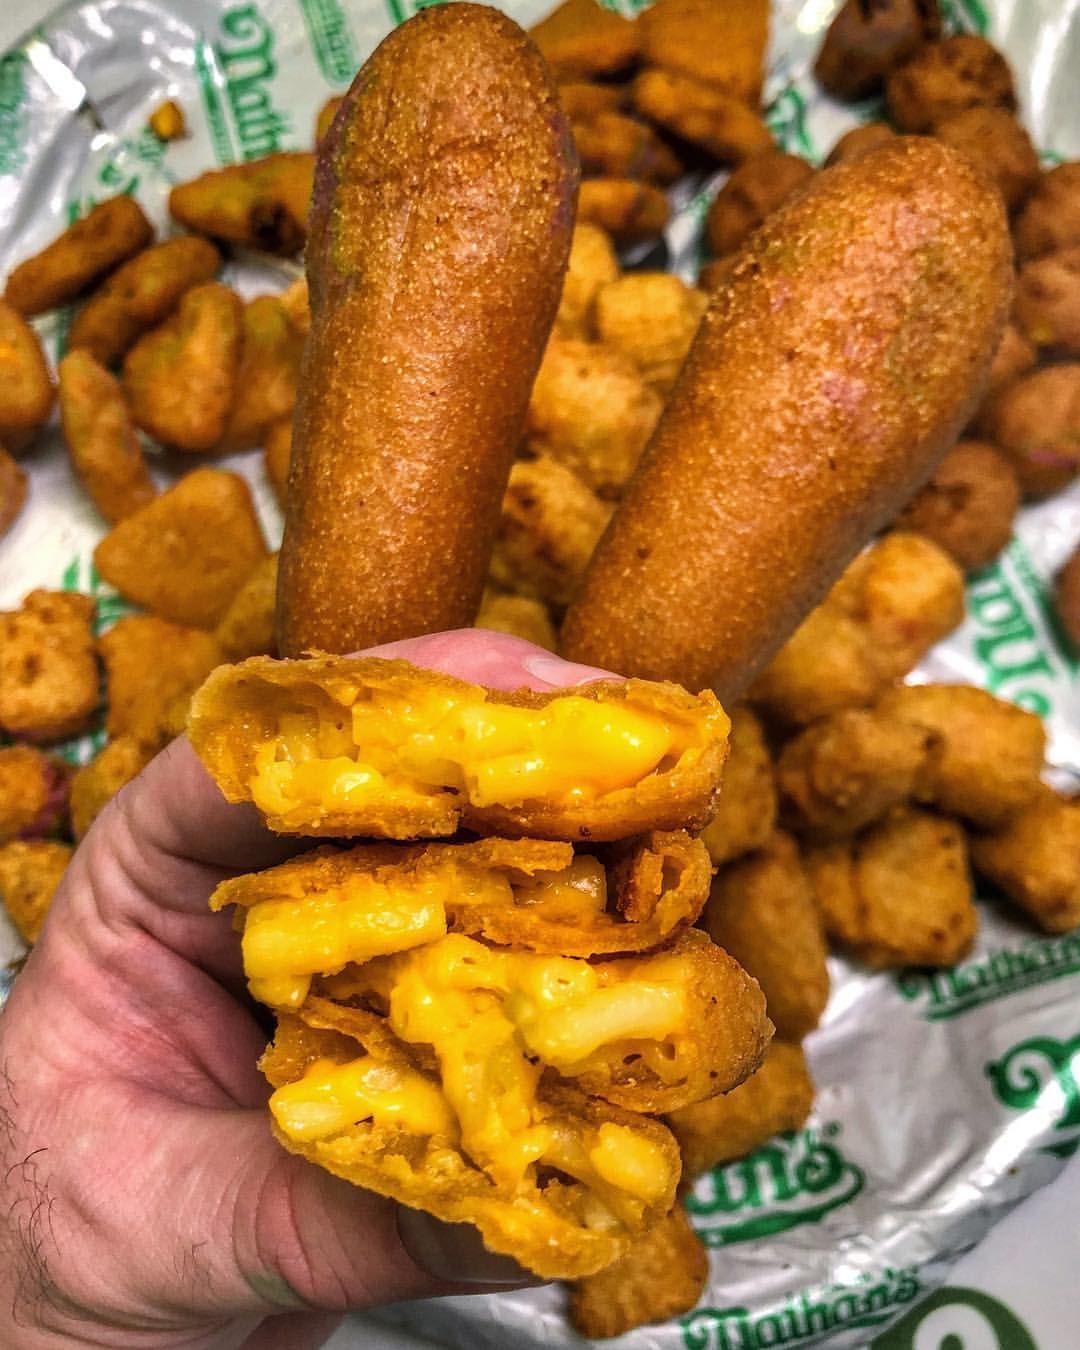 Jalapeno Corn Fritters Hush Puppies And Mac N Cheese Bites Cheese Bites Mac N Cheese Mac N Cheese Bites